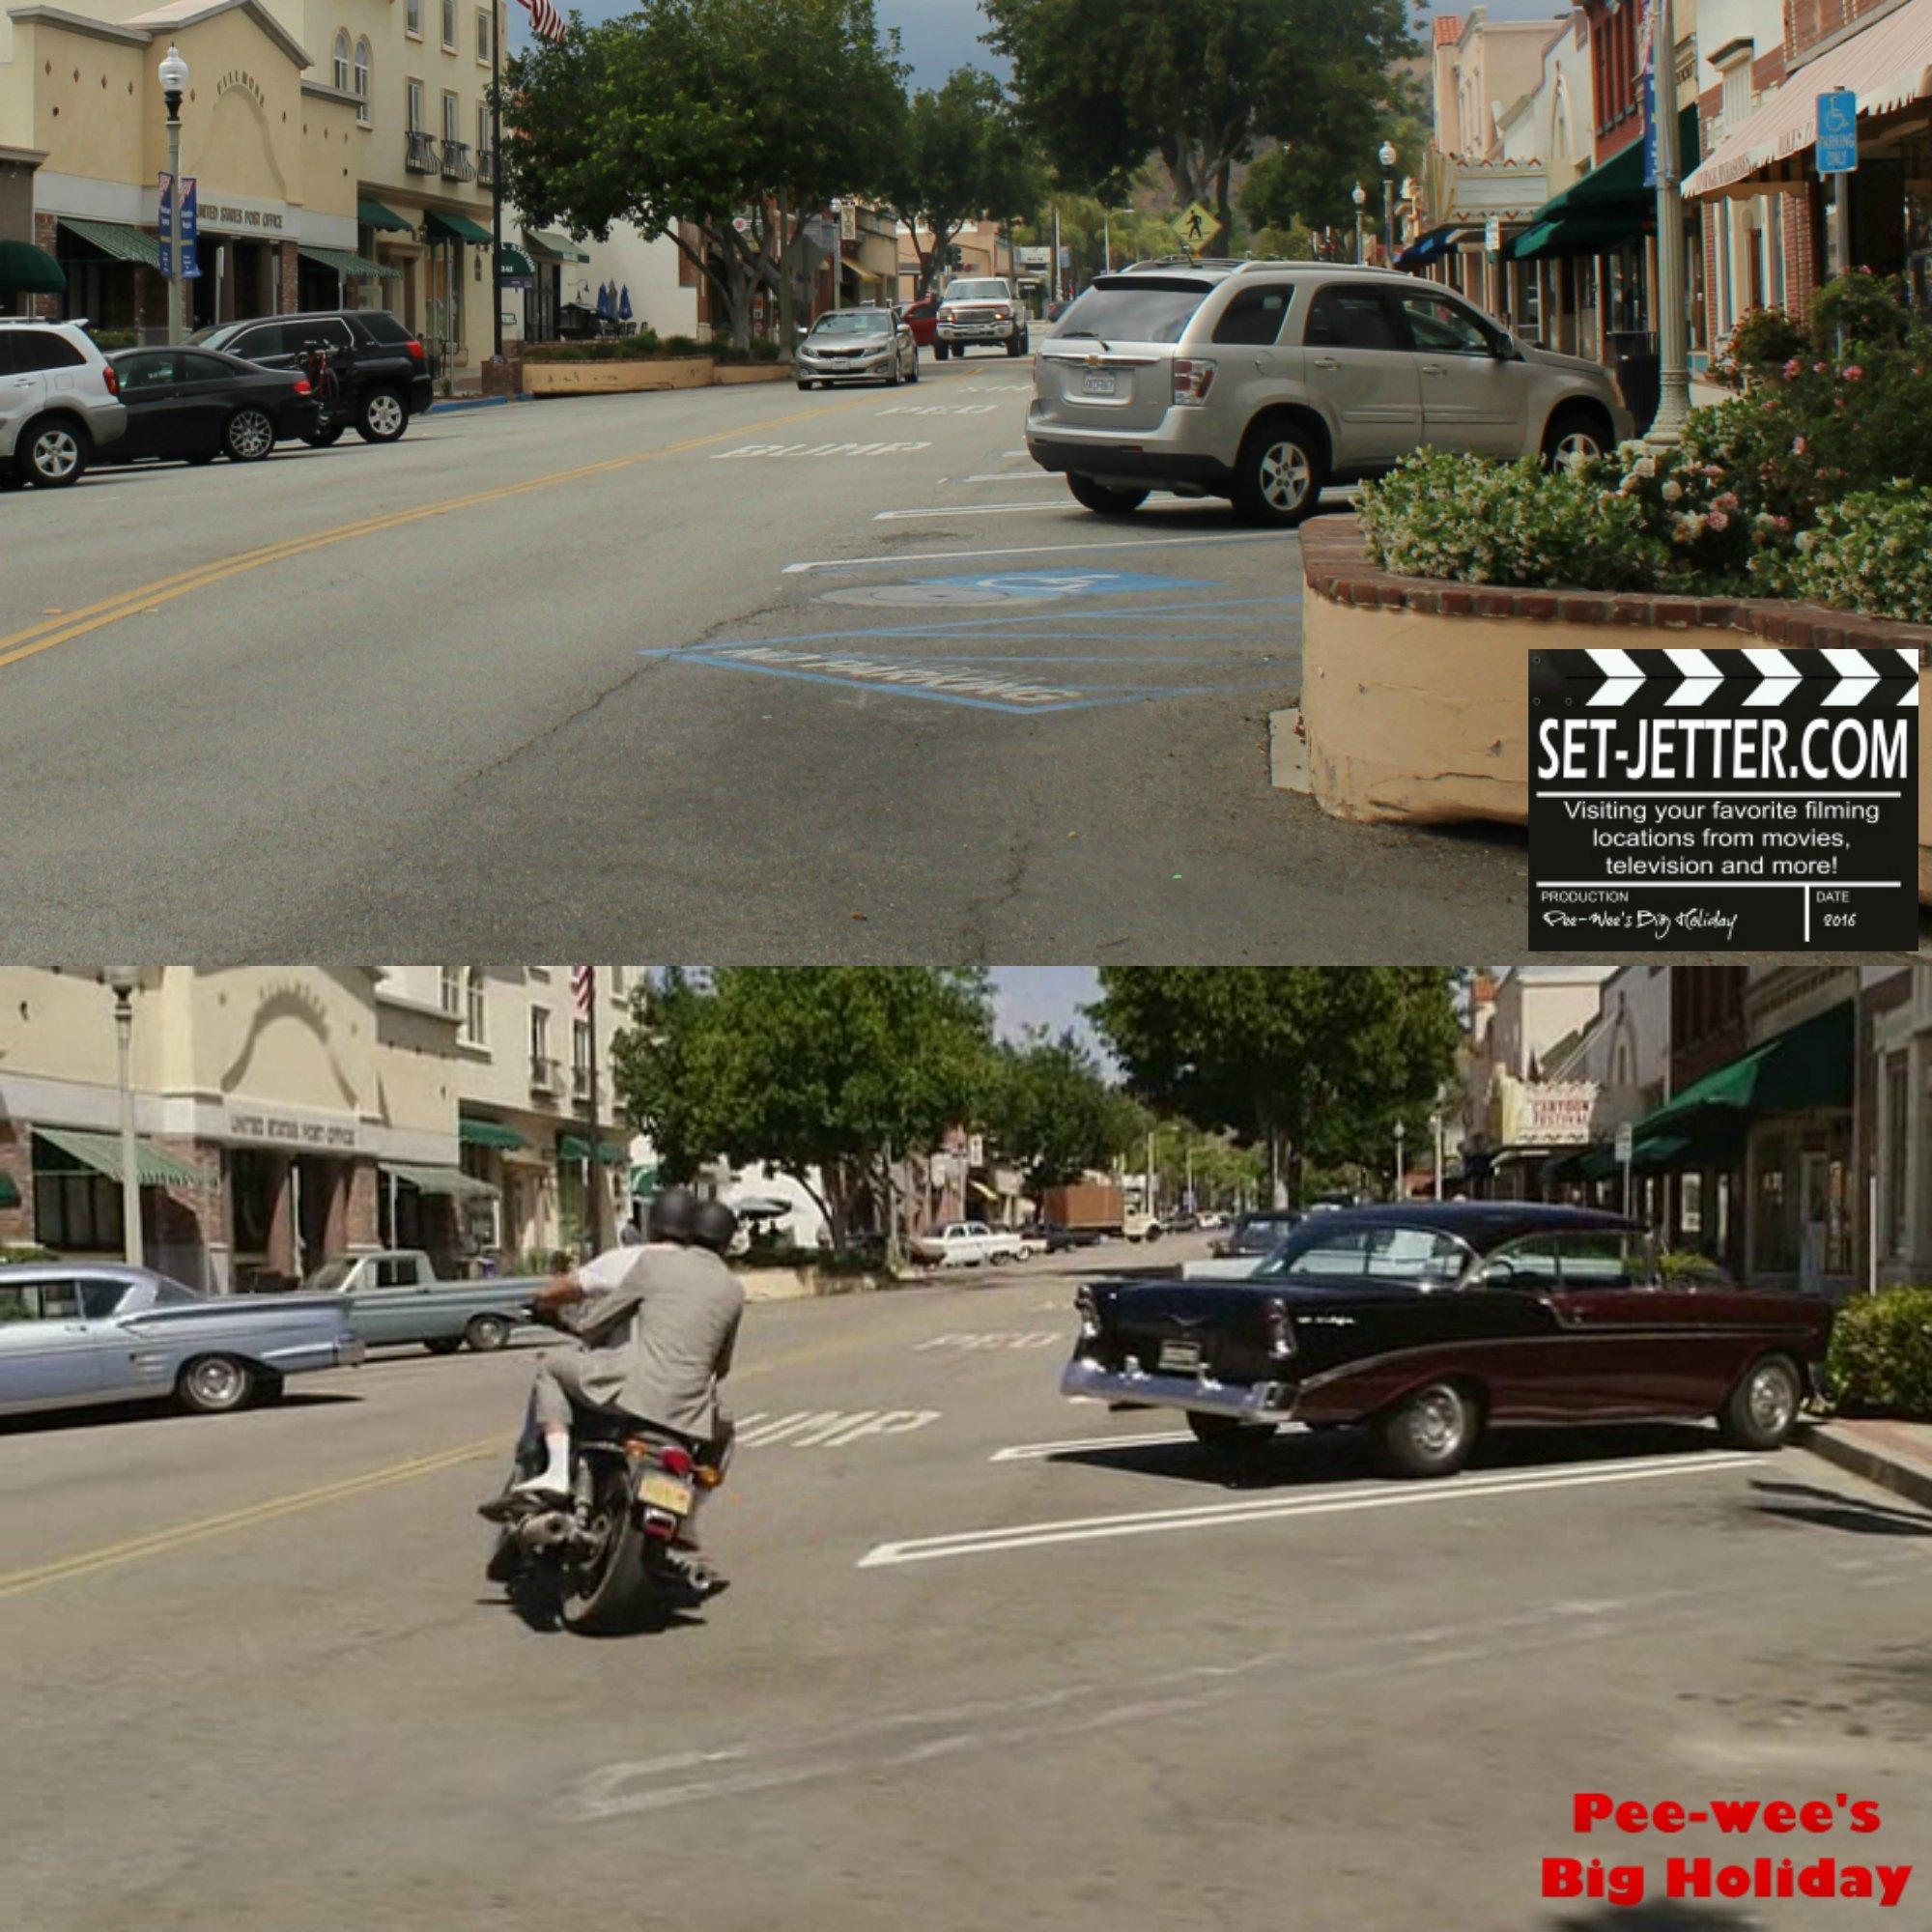 Pee Wee's Big Holiday comparison 301.jpg